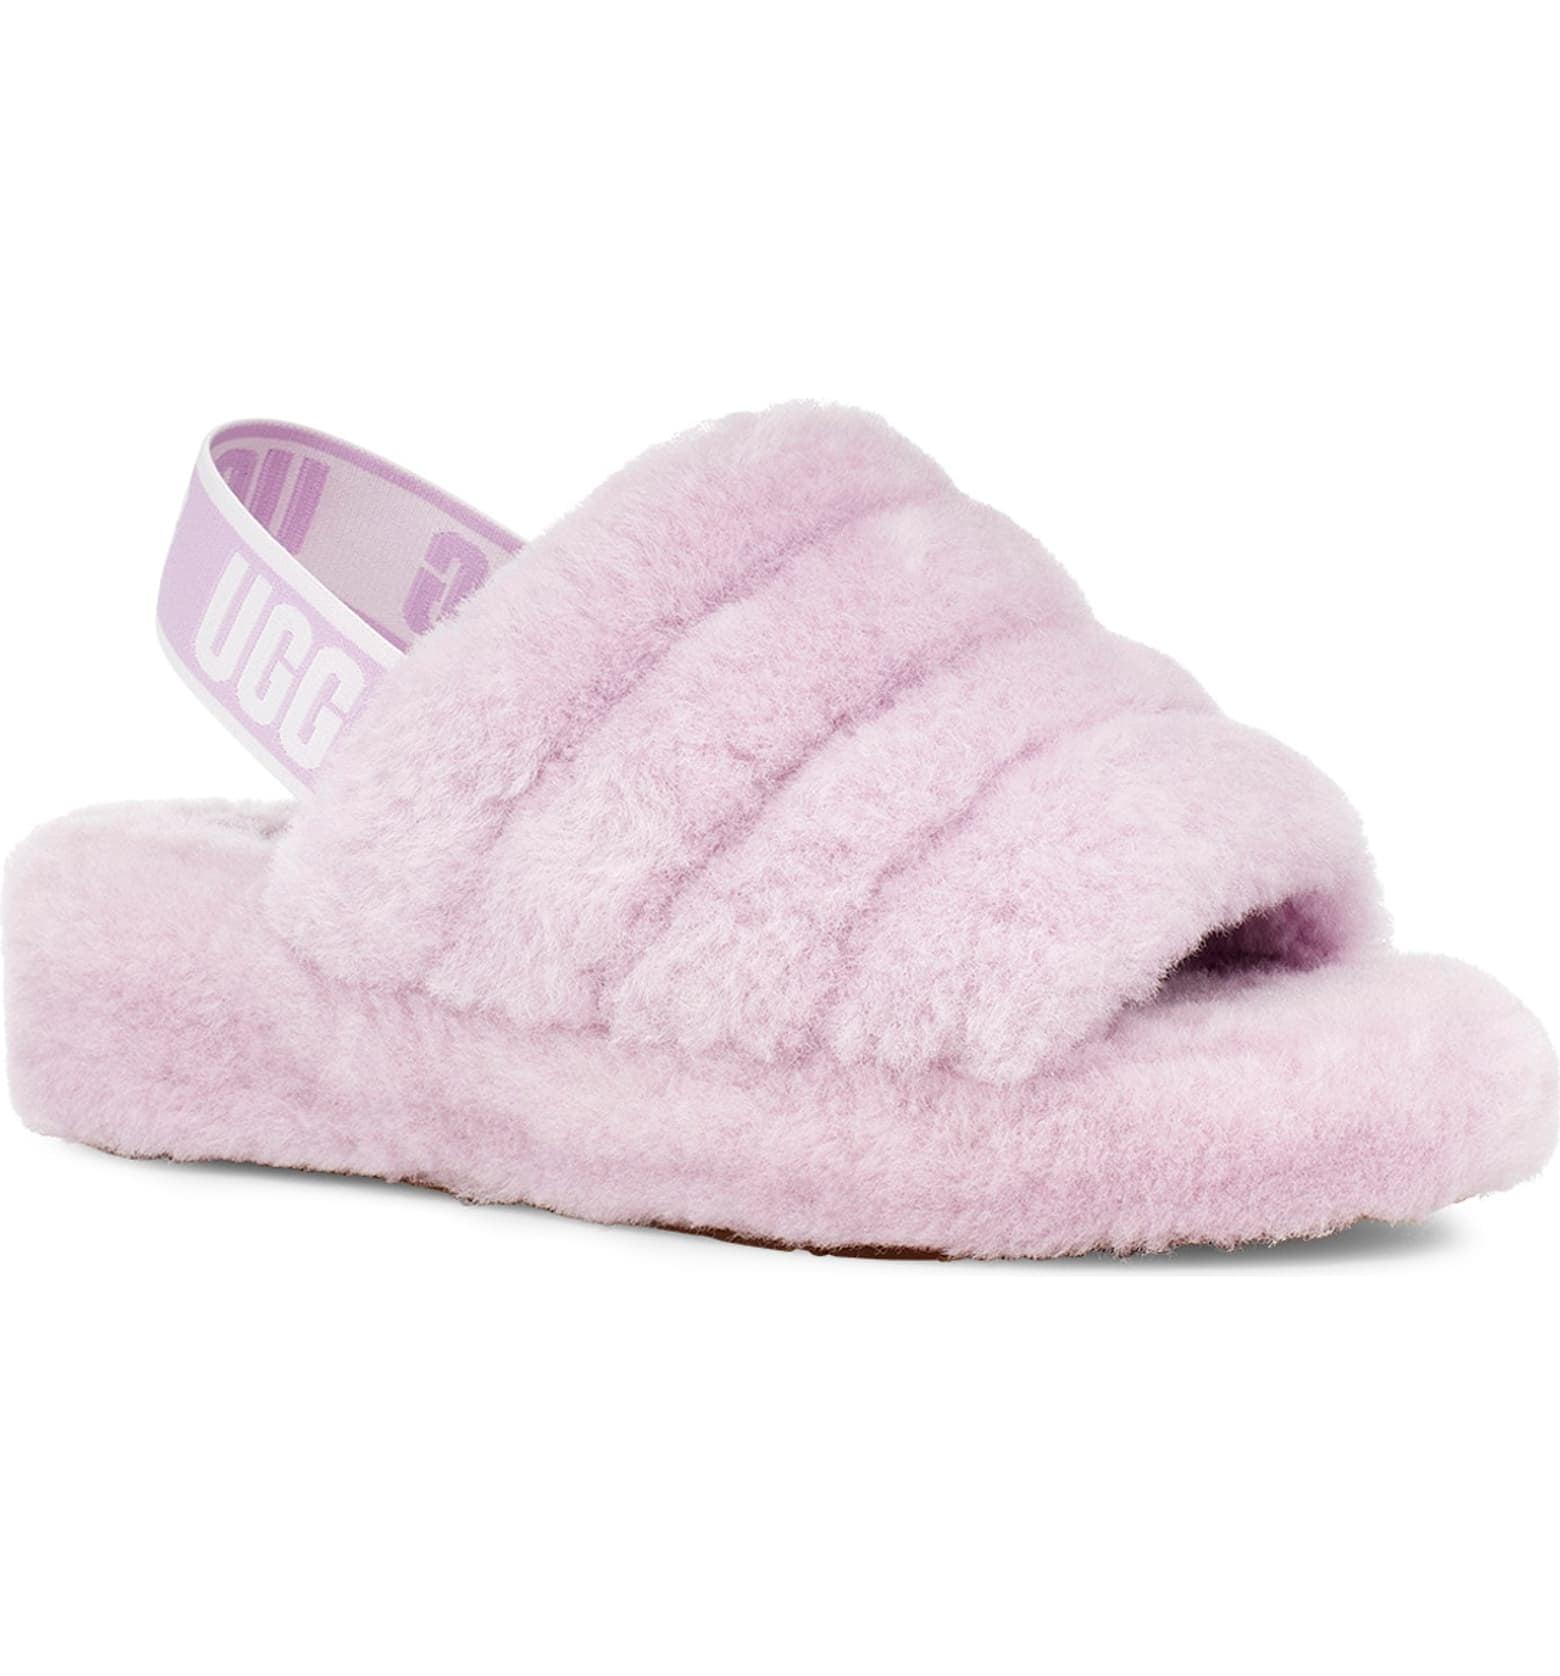 fuzzy ugg slippers